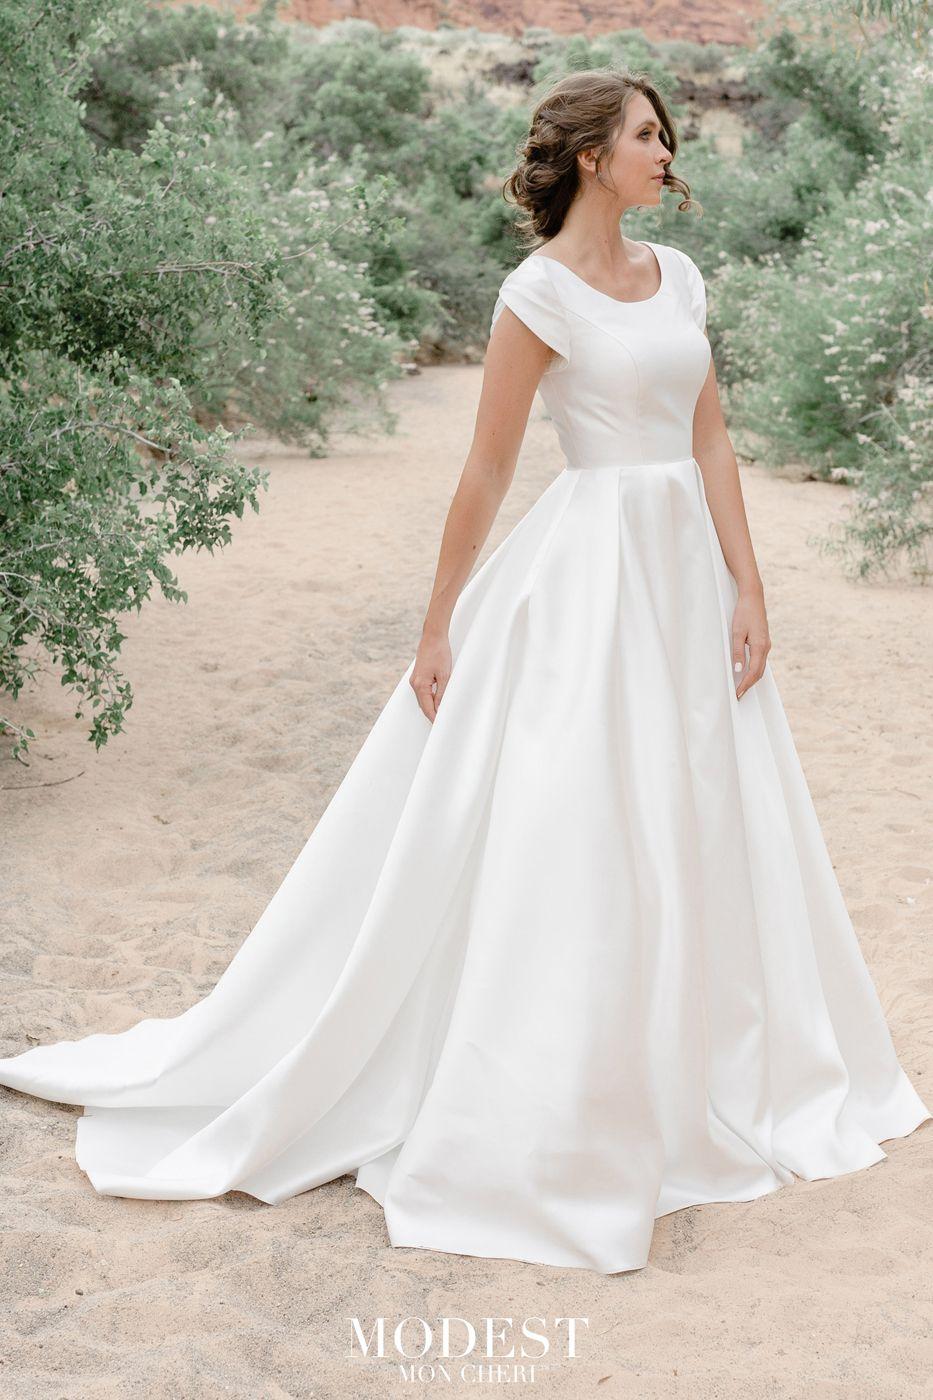 Modest Bridal By Mon Cheri Tr12033 Tulip Sleeve Wedding Dress In 2020 Short Sleeve Wedding Dress Modest Wedding Dresses Wedding Dresses Lace